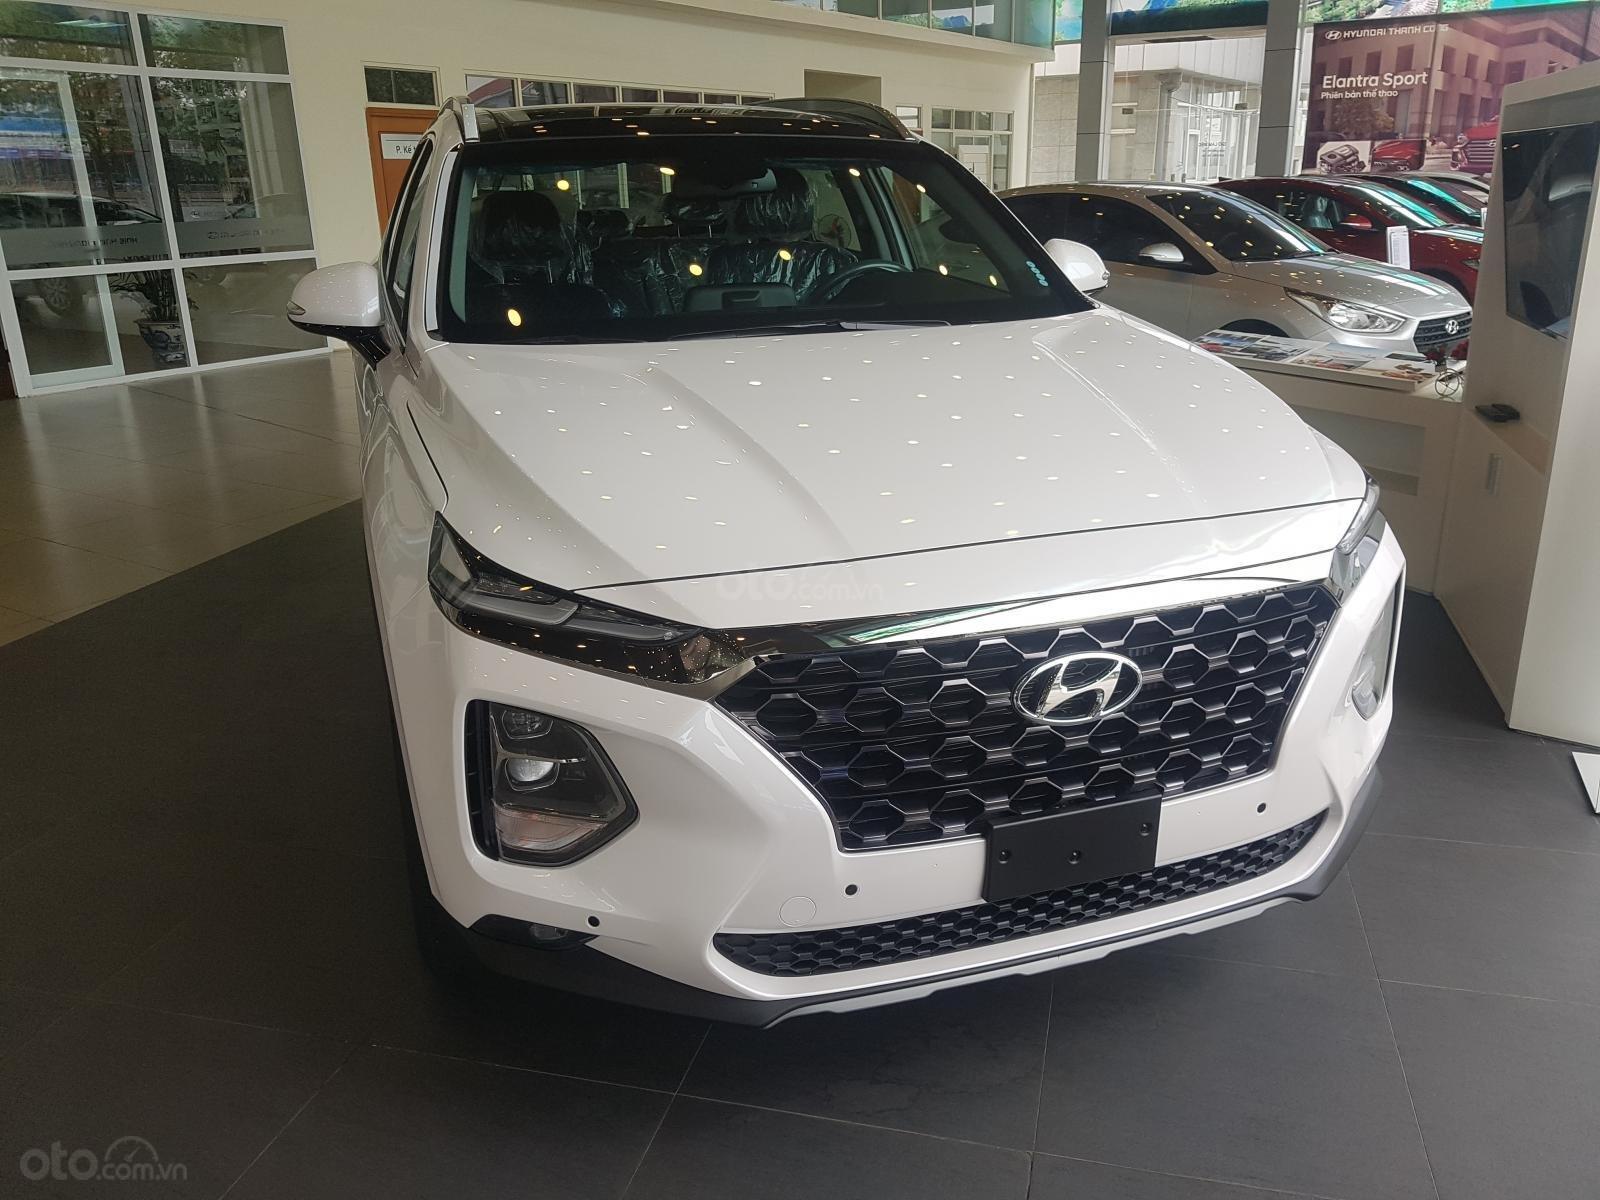 Bán Hyundai Santafe 2019 - Vay 80% - 313tr có xe ngay-1